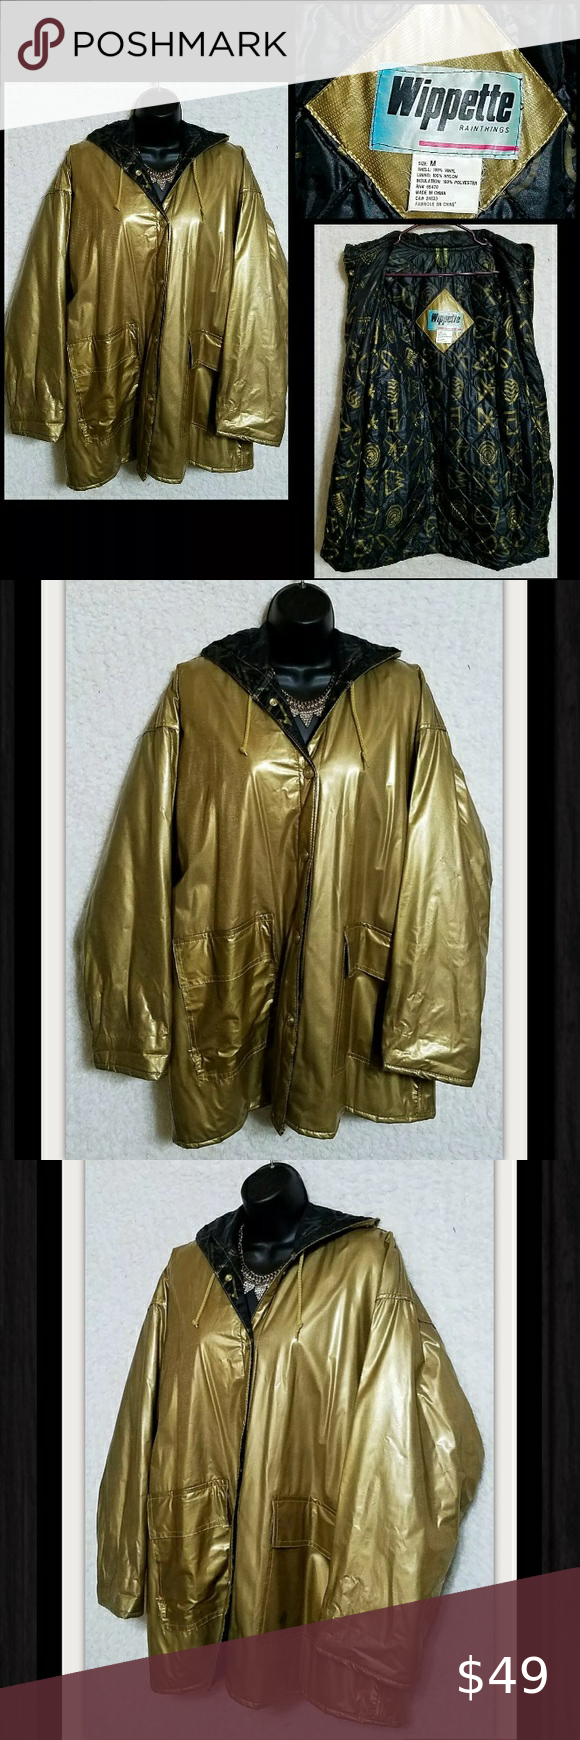 Vtg Wippette Gold Black Raincoat Hooded Jacket M In 2020 Hooded Jacket Shiny Jacket